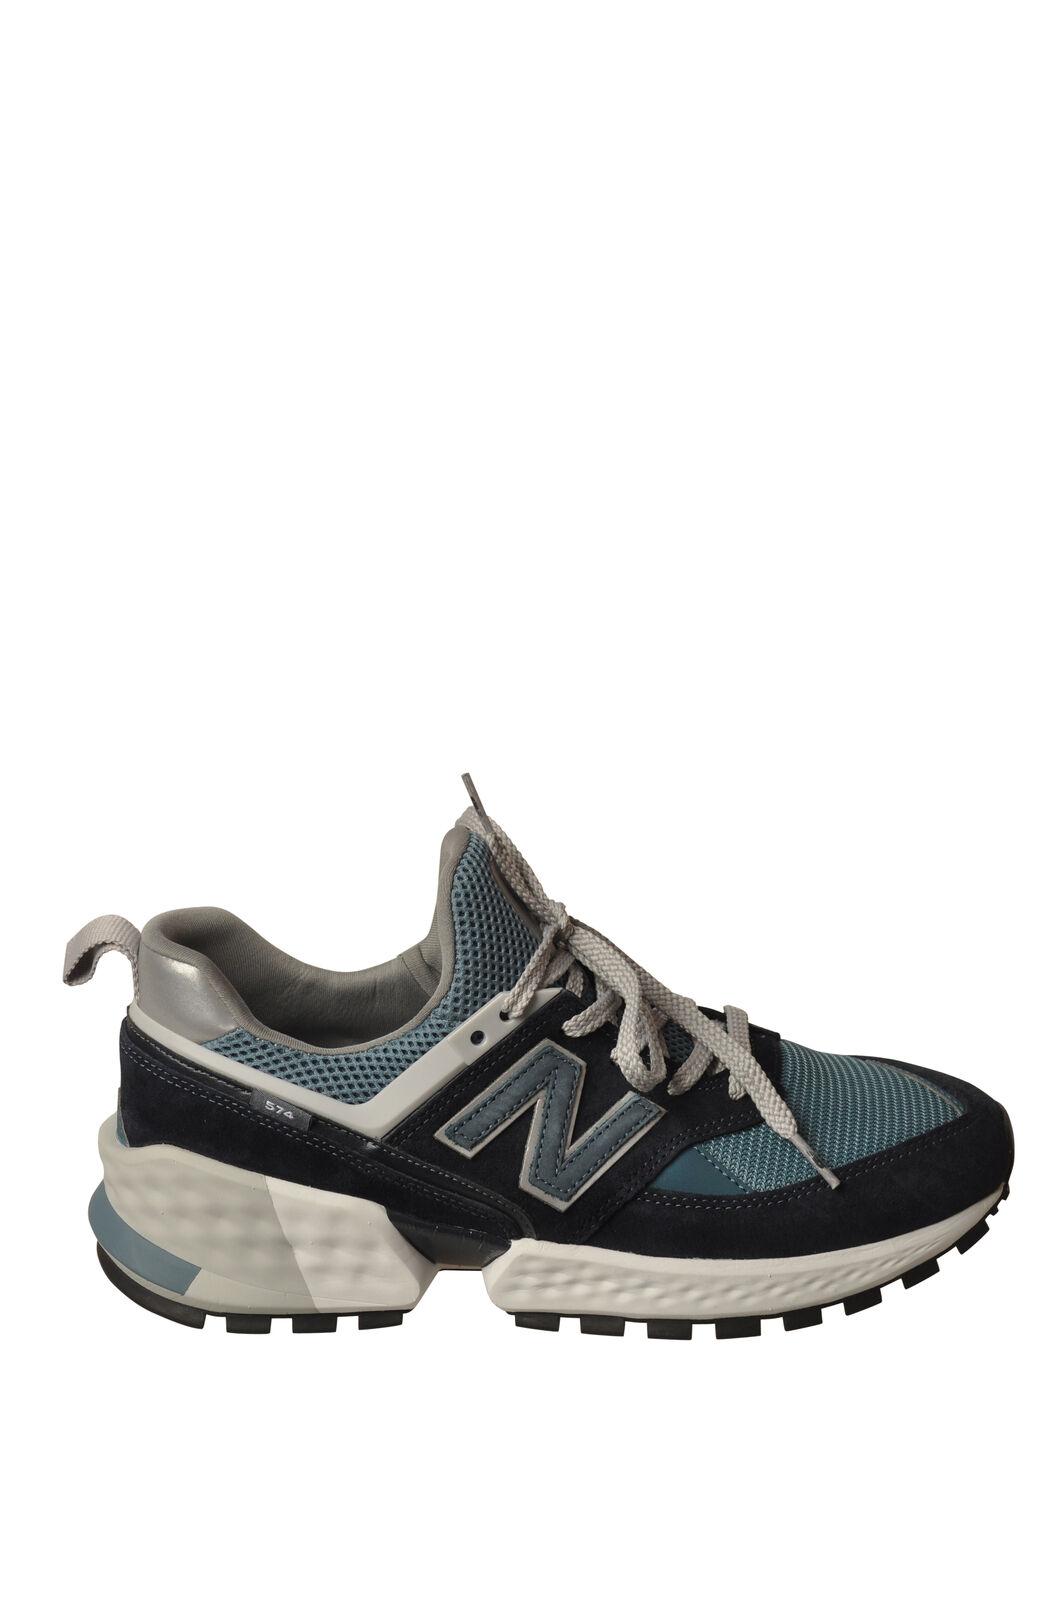 New Balance - shoes-Lace Up - Man - bluee - 6219330C190724